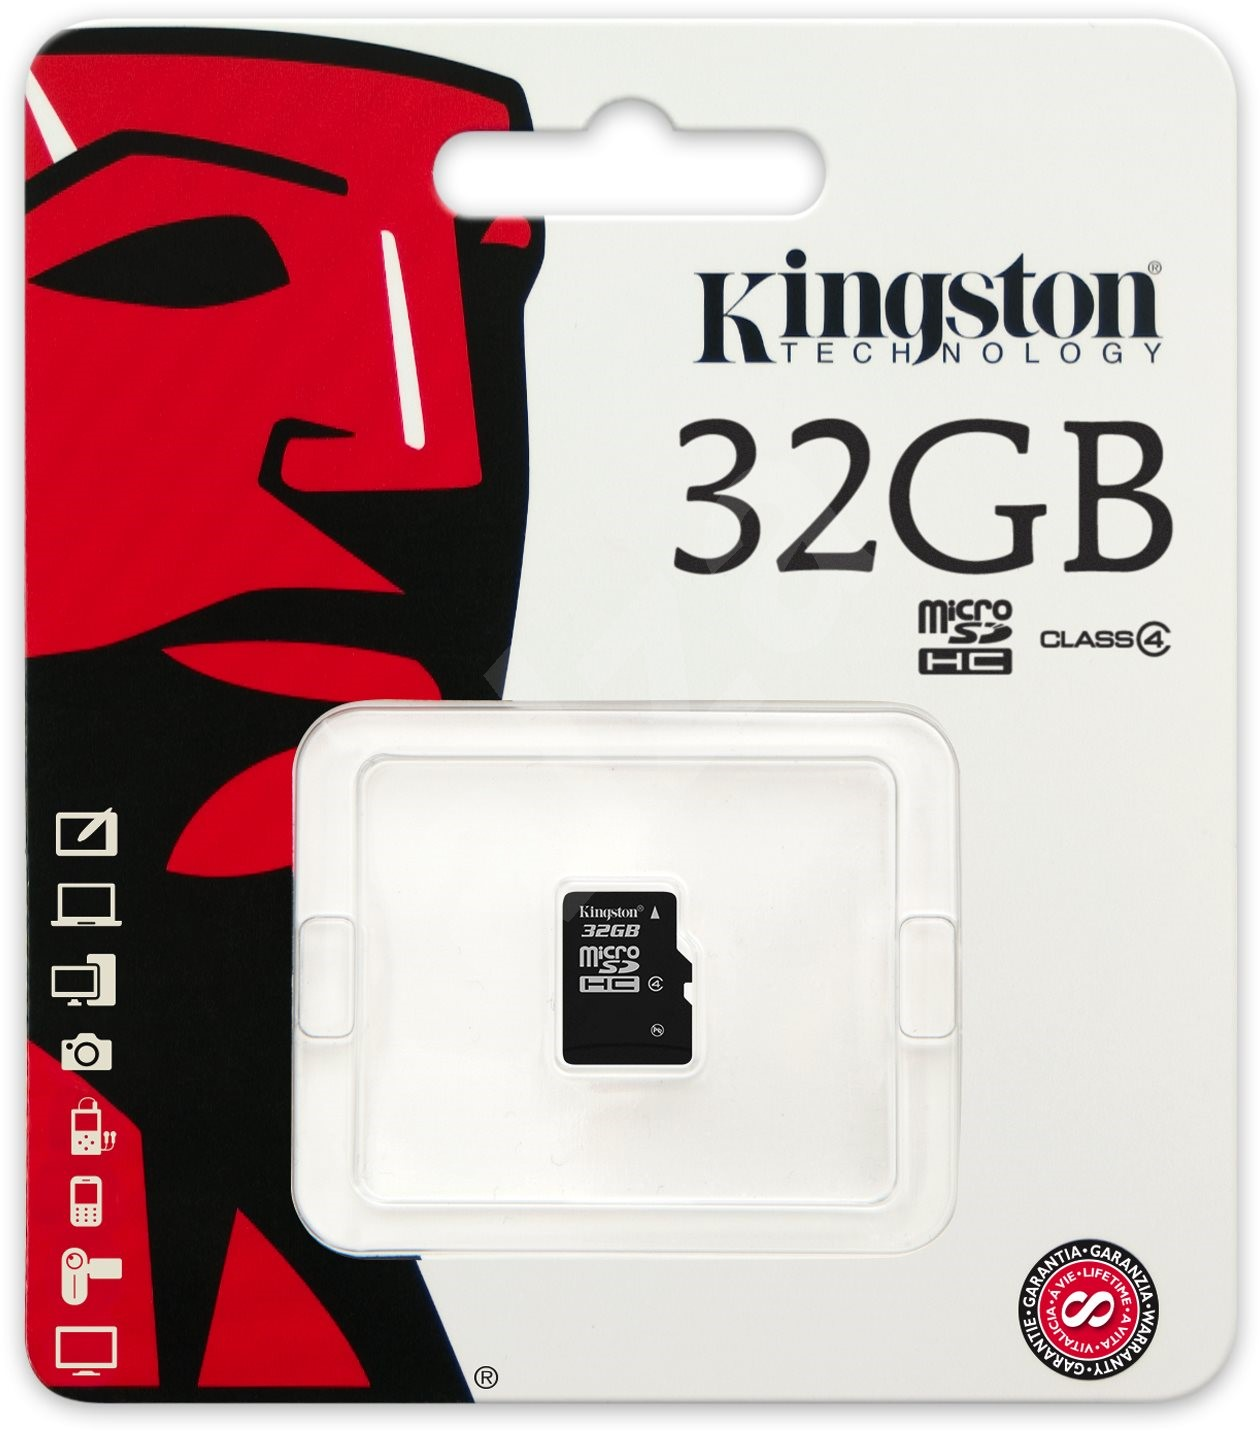 micro kingston 32gb sdhc class 4 speicherkarte. Black Bedroom Furniture Sets. Home Design Ideas